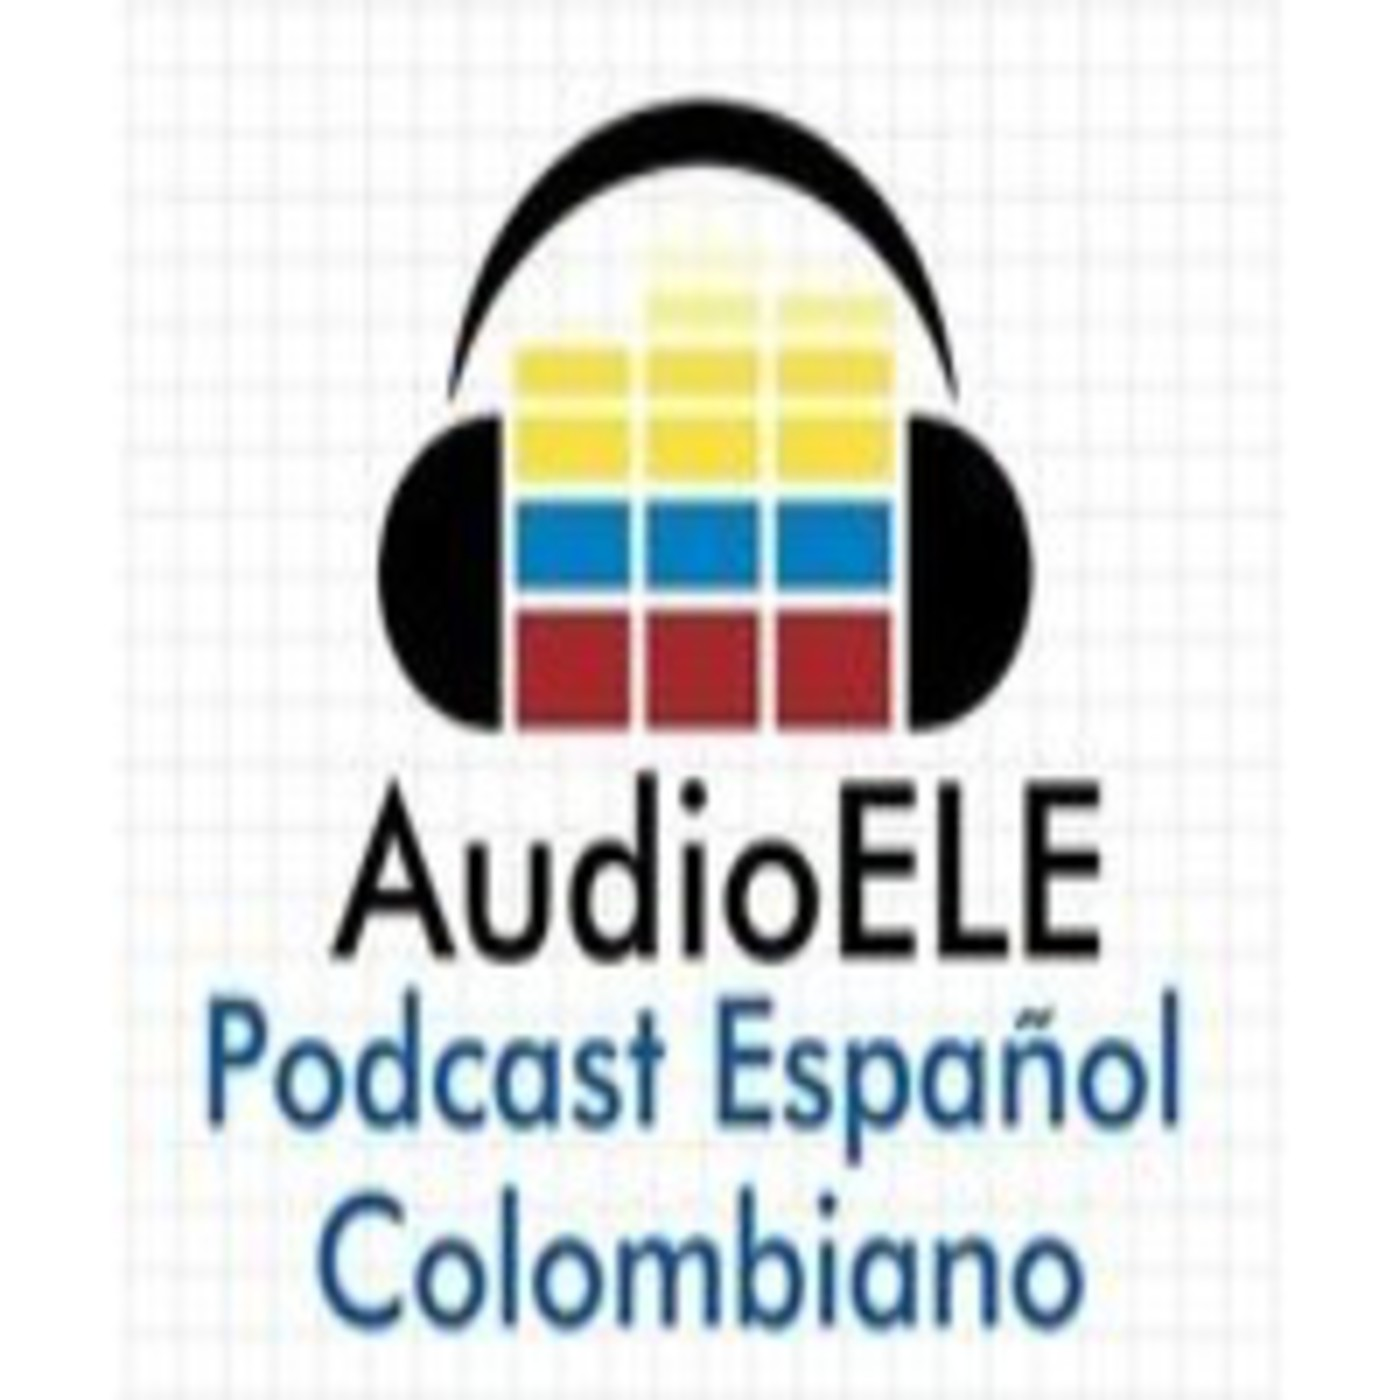 <![CDATA[AudioELE: Podcast de español colombiano ]]>